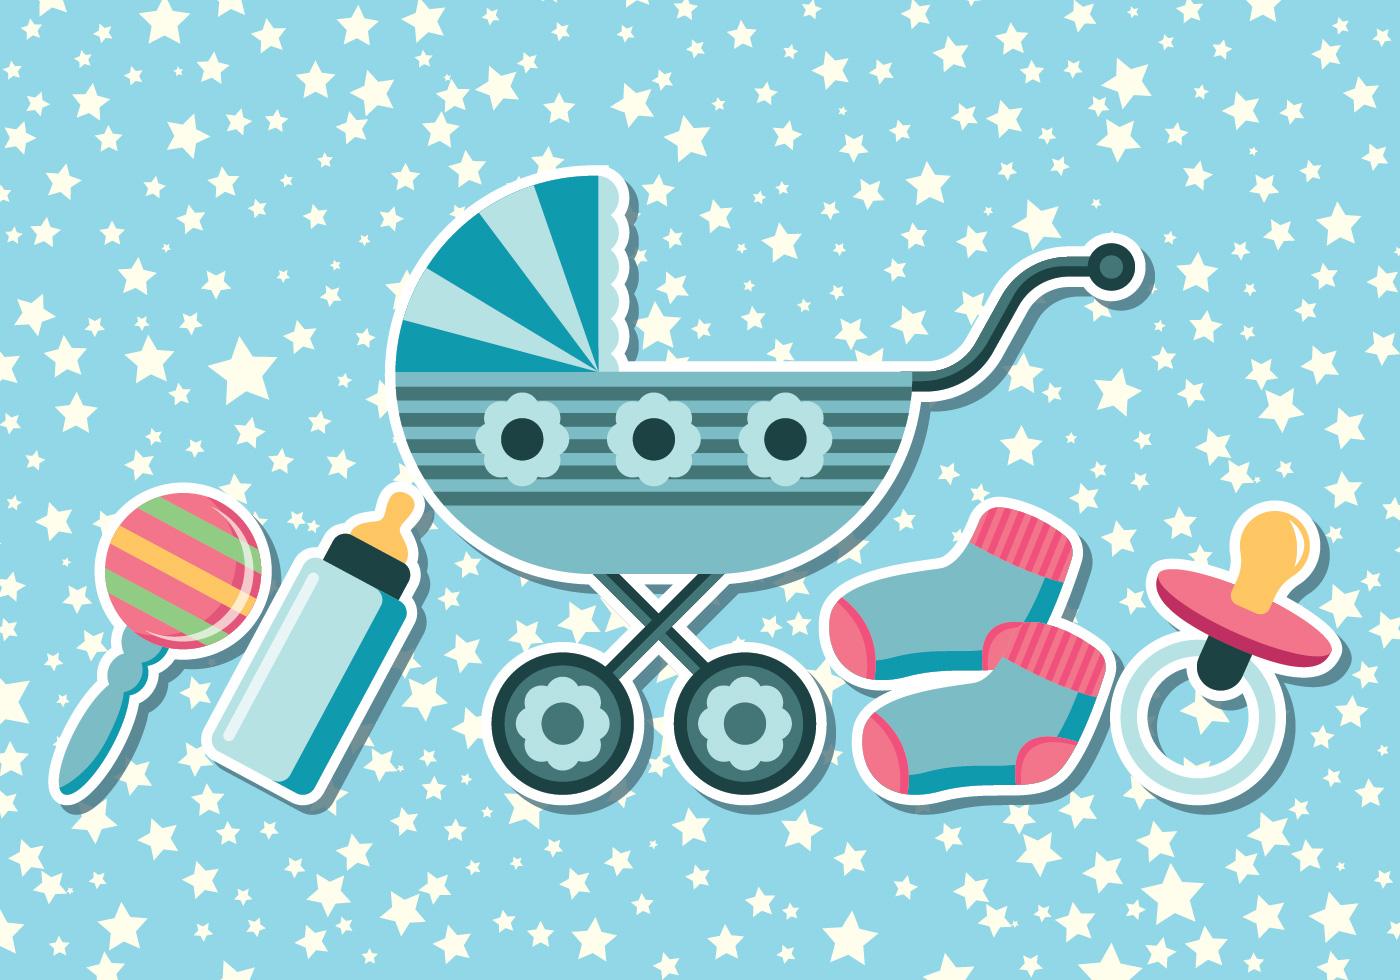 Baby Shower Backgrounds Download Free Vectors Clipart Graphics Vector Art